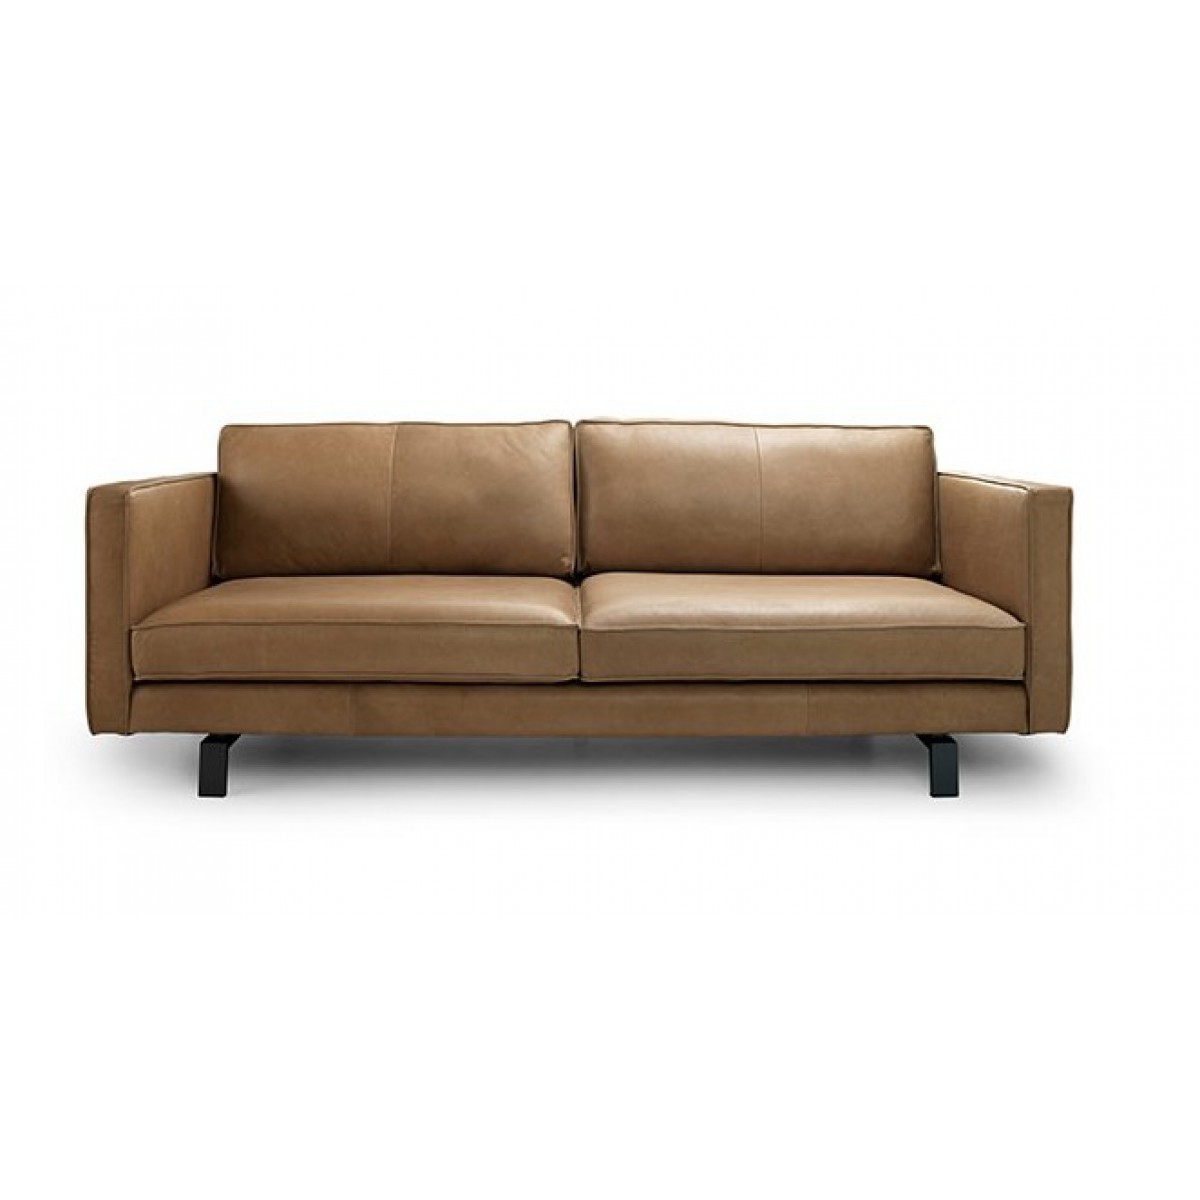 havana-design-bank-leer-leder-retro-africa-stonewash-cuba